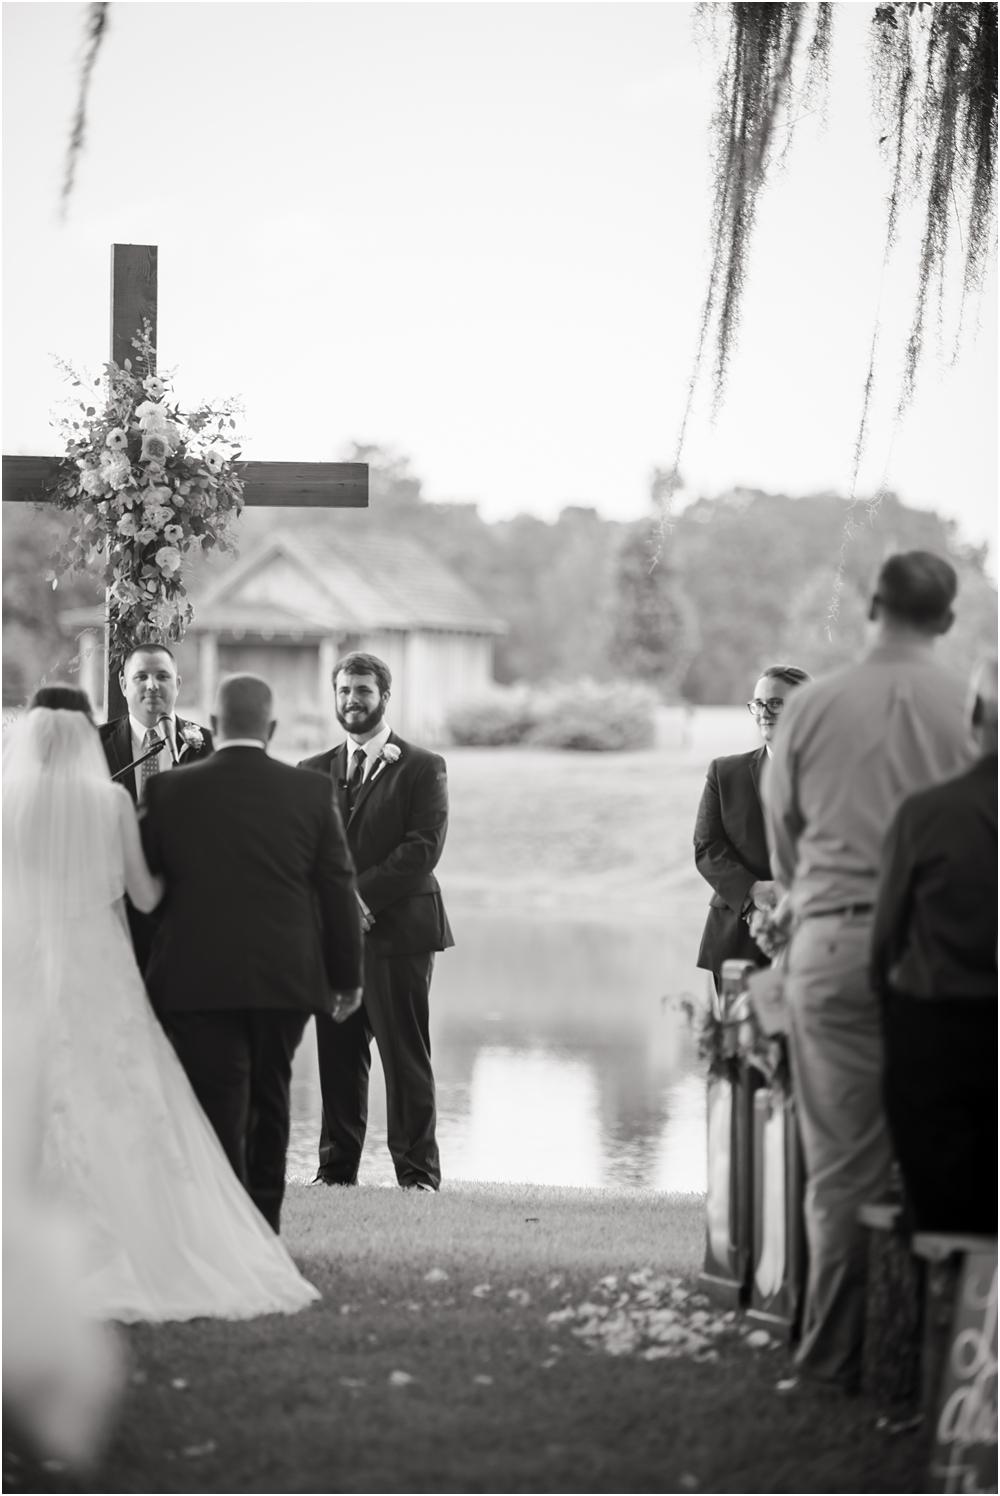 marianna-florida-wedding-photographer-kiersten-grant-121.jpg